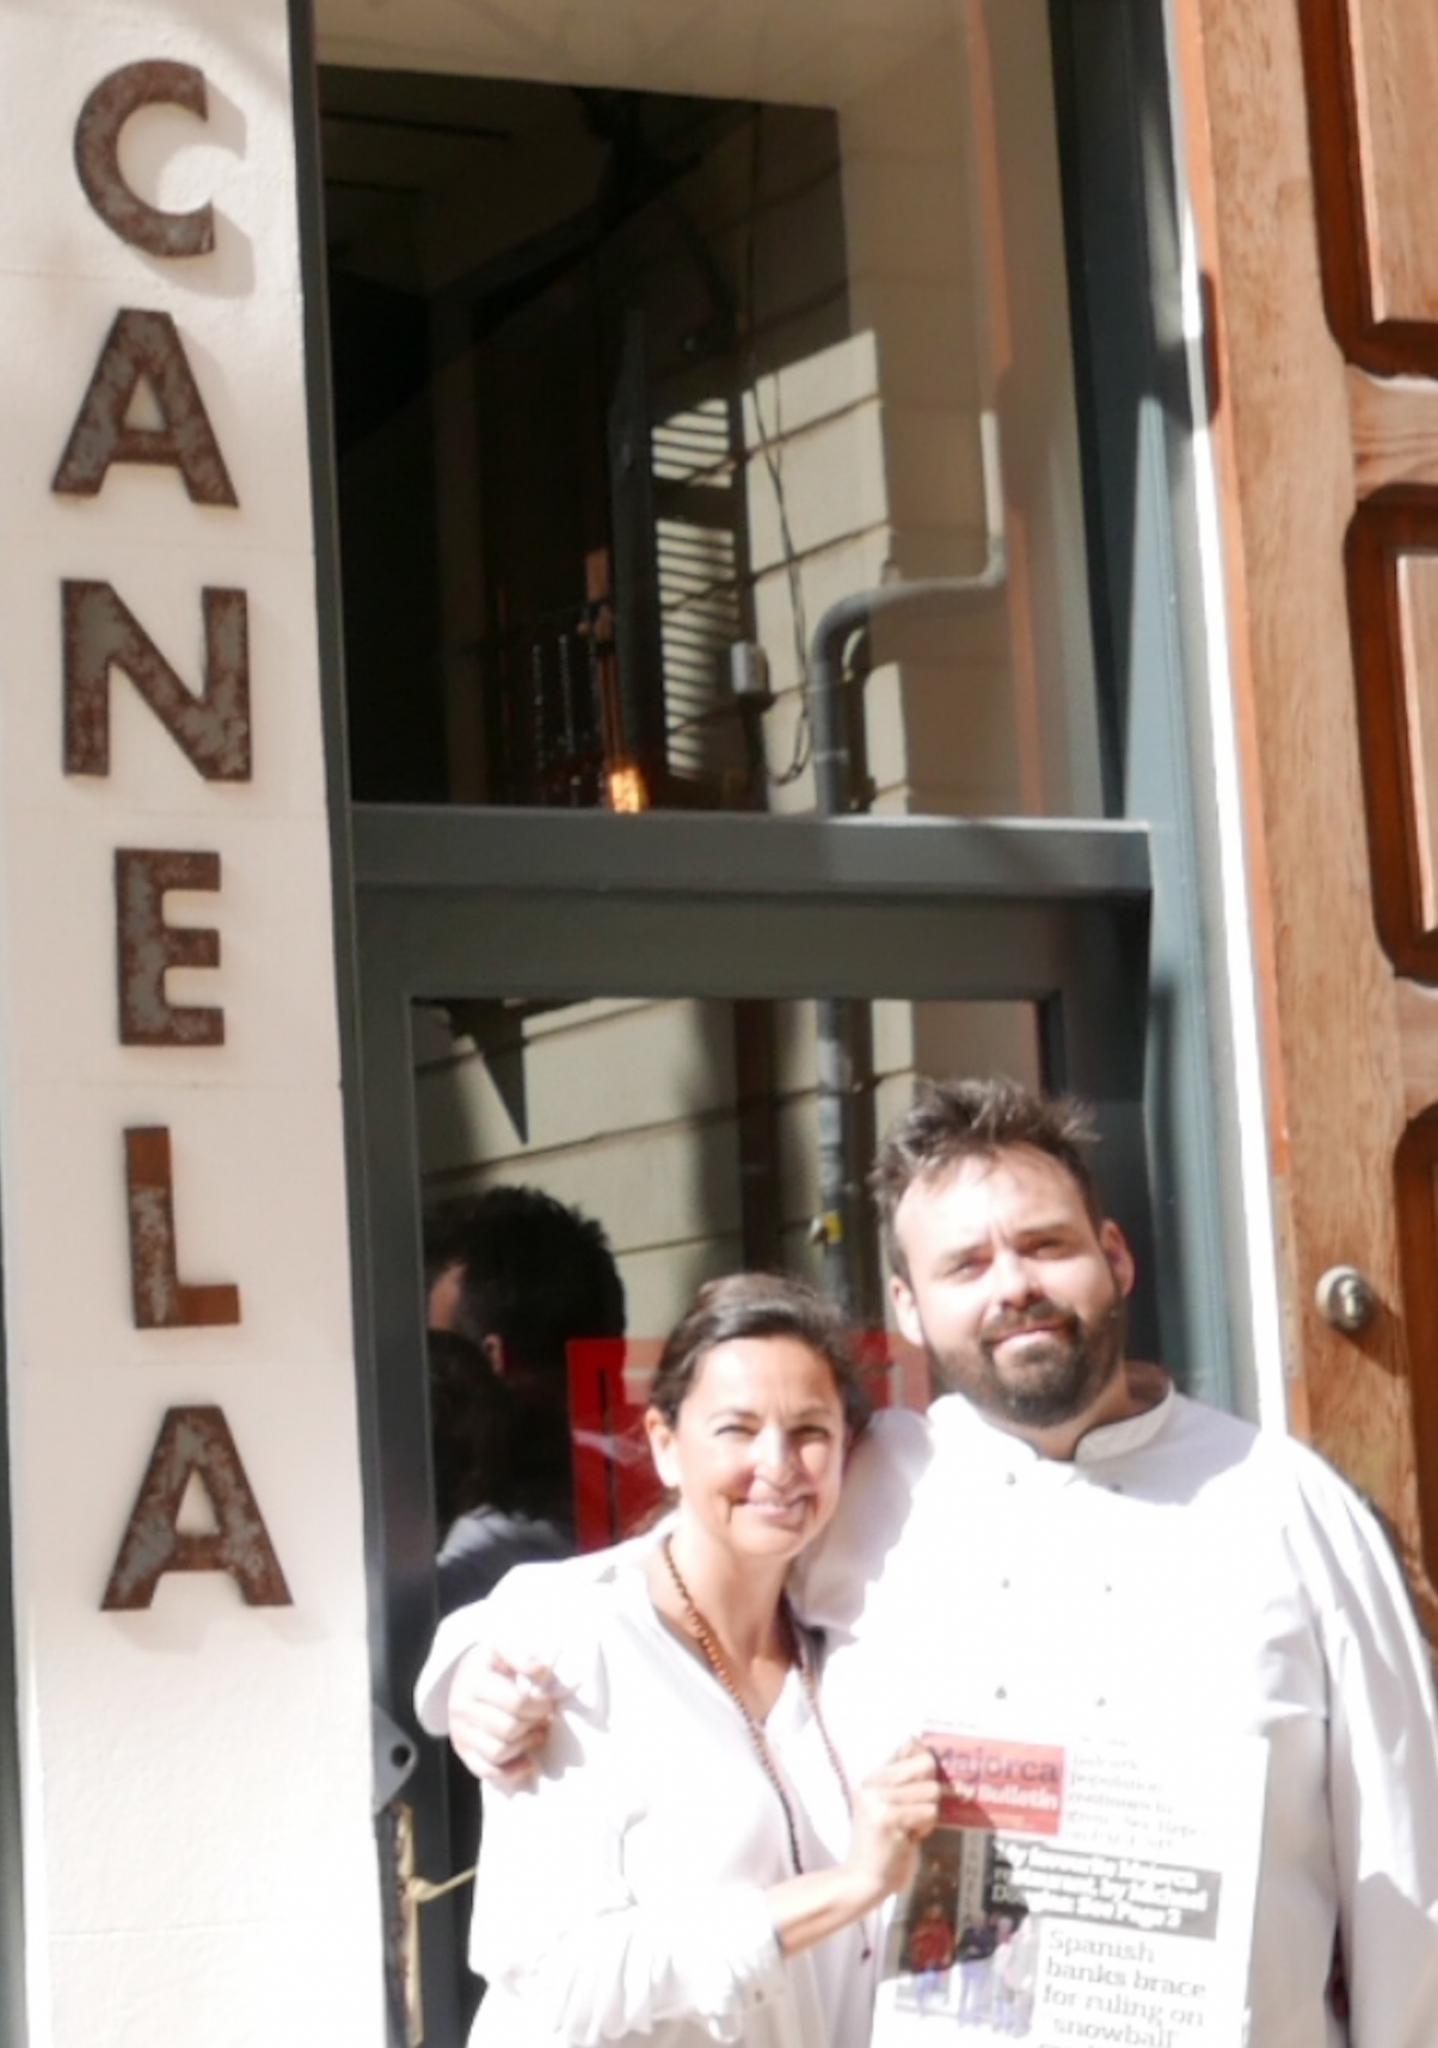 Irene Rigo & Majorcan Chef, Fabián Fuster at Canela in Palma.